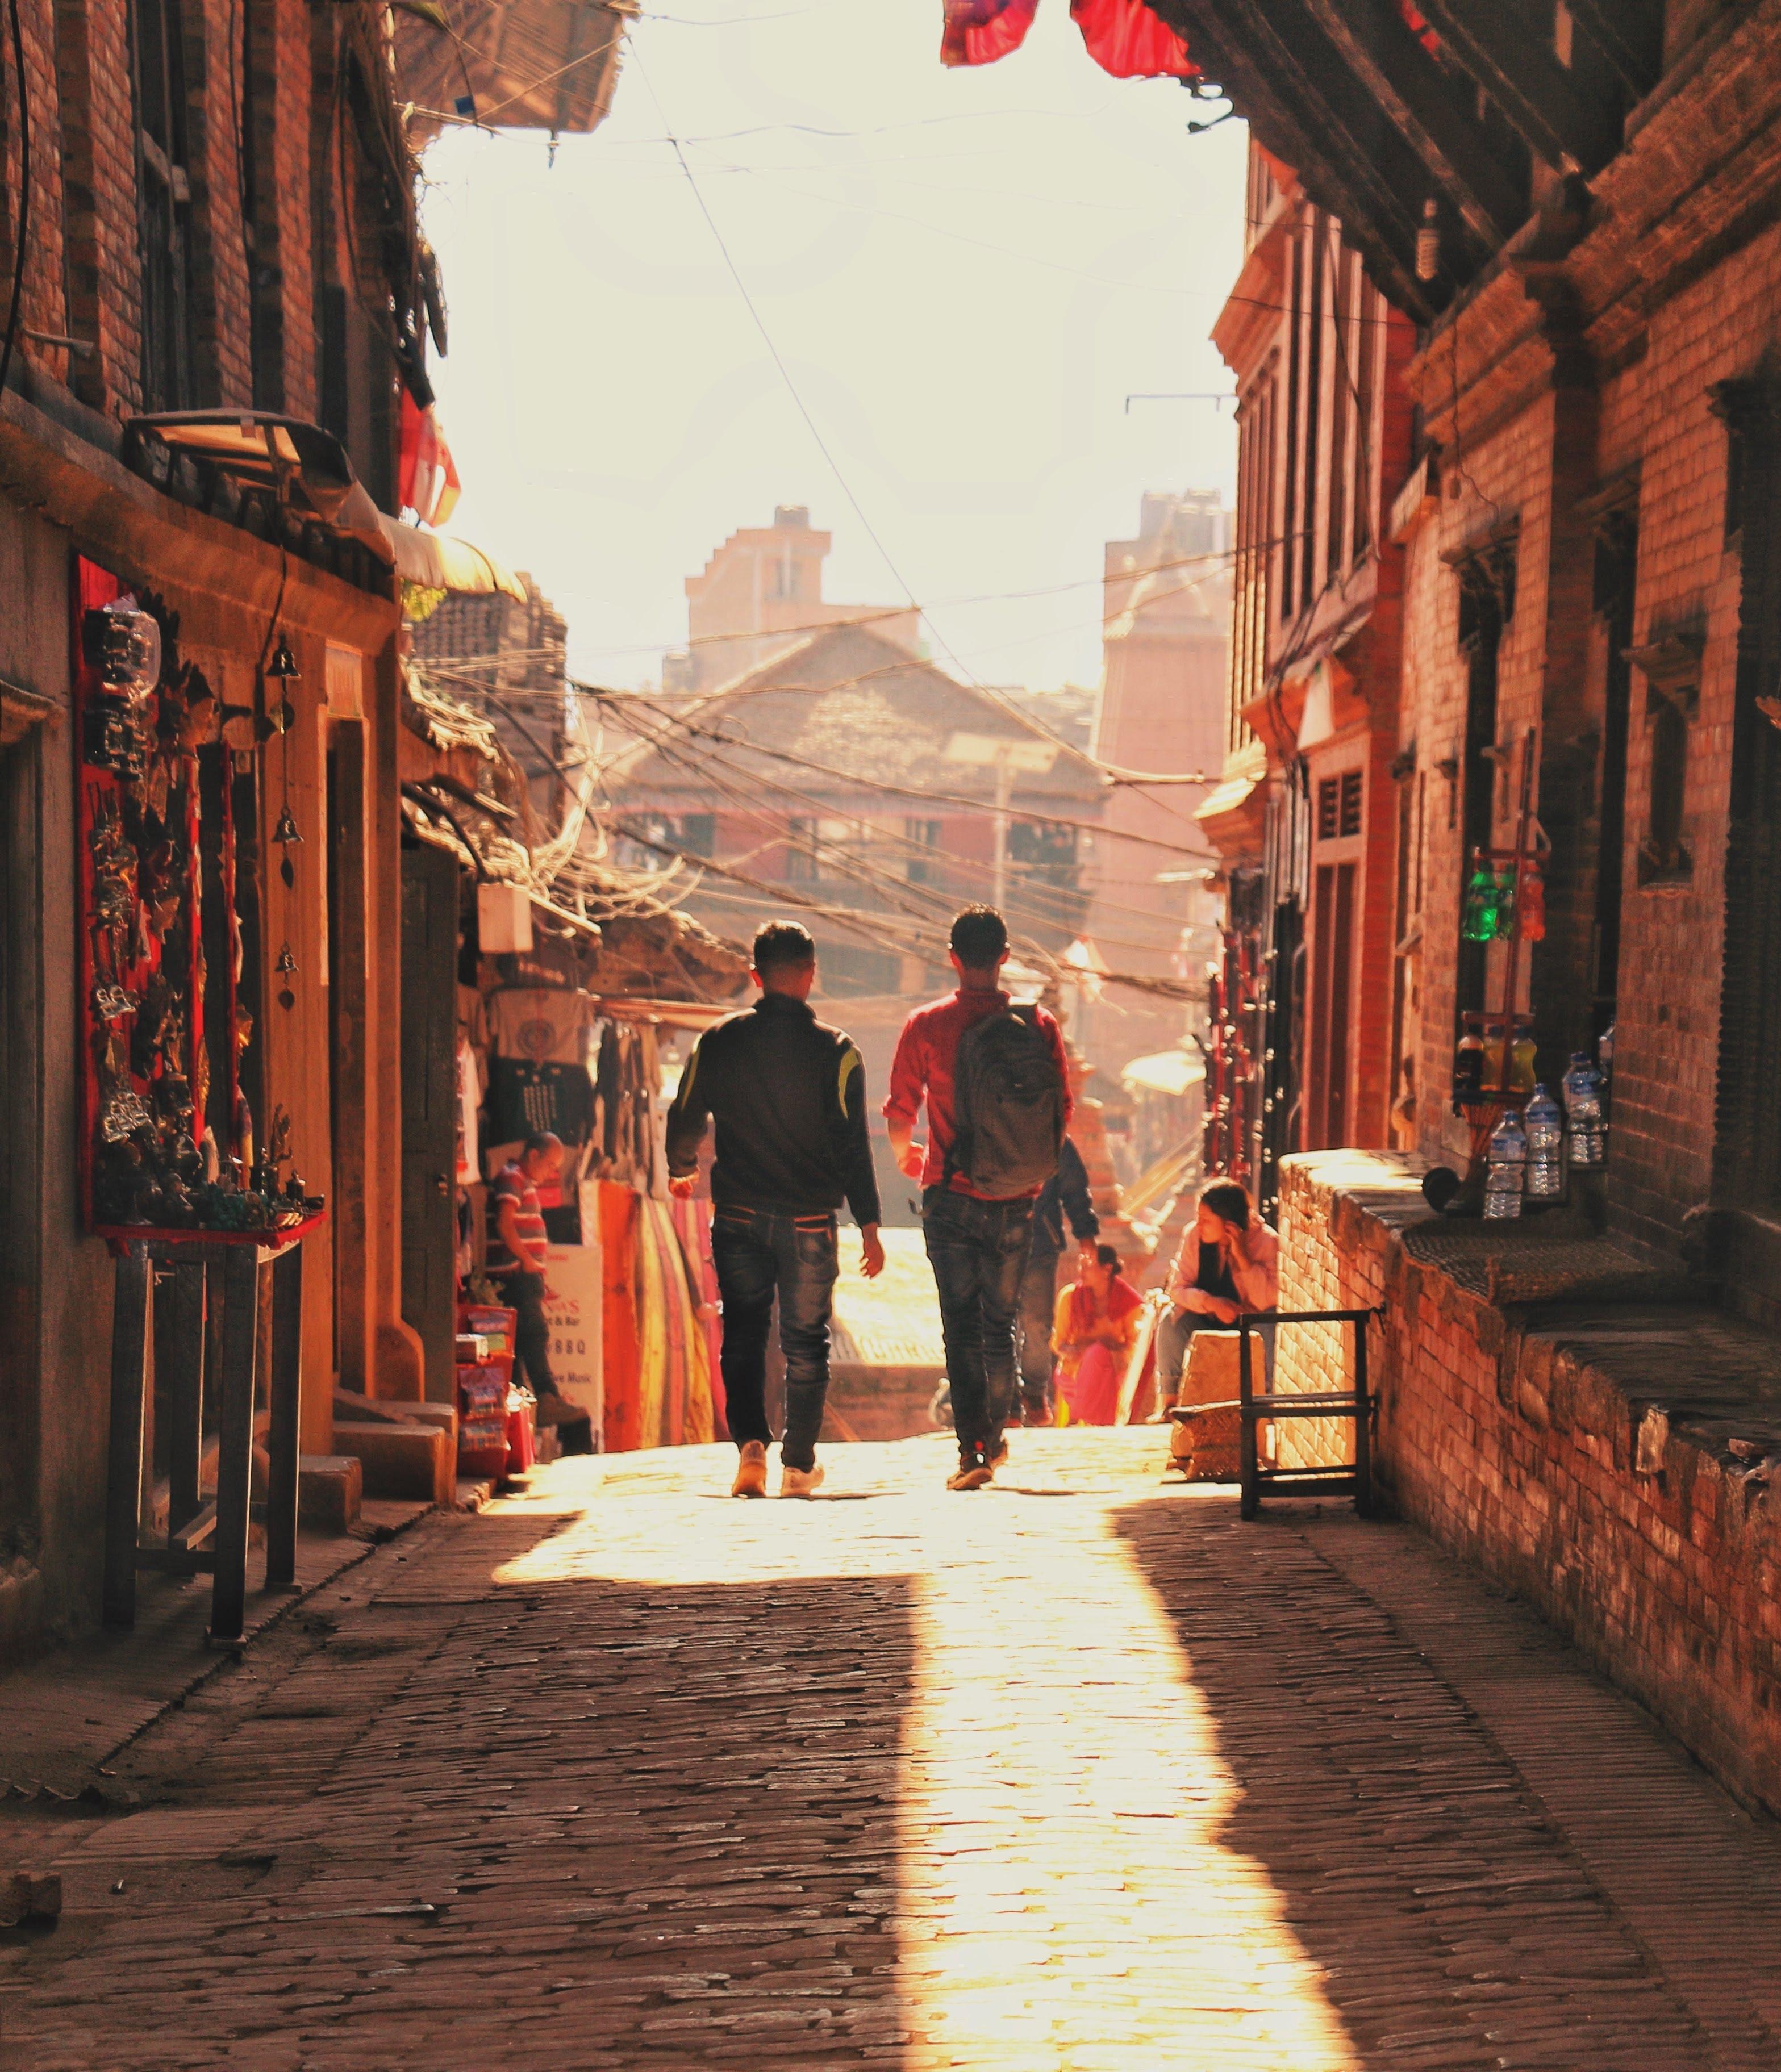 Two man walking beside brick houses photo